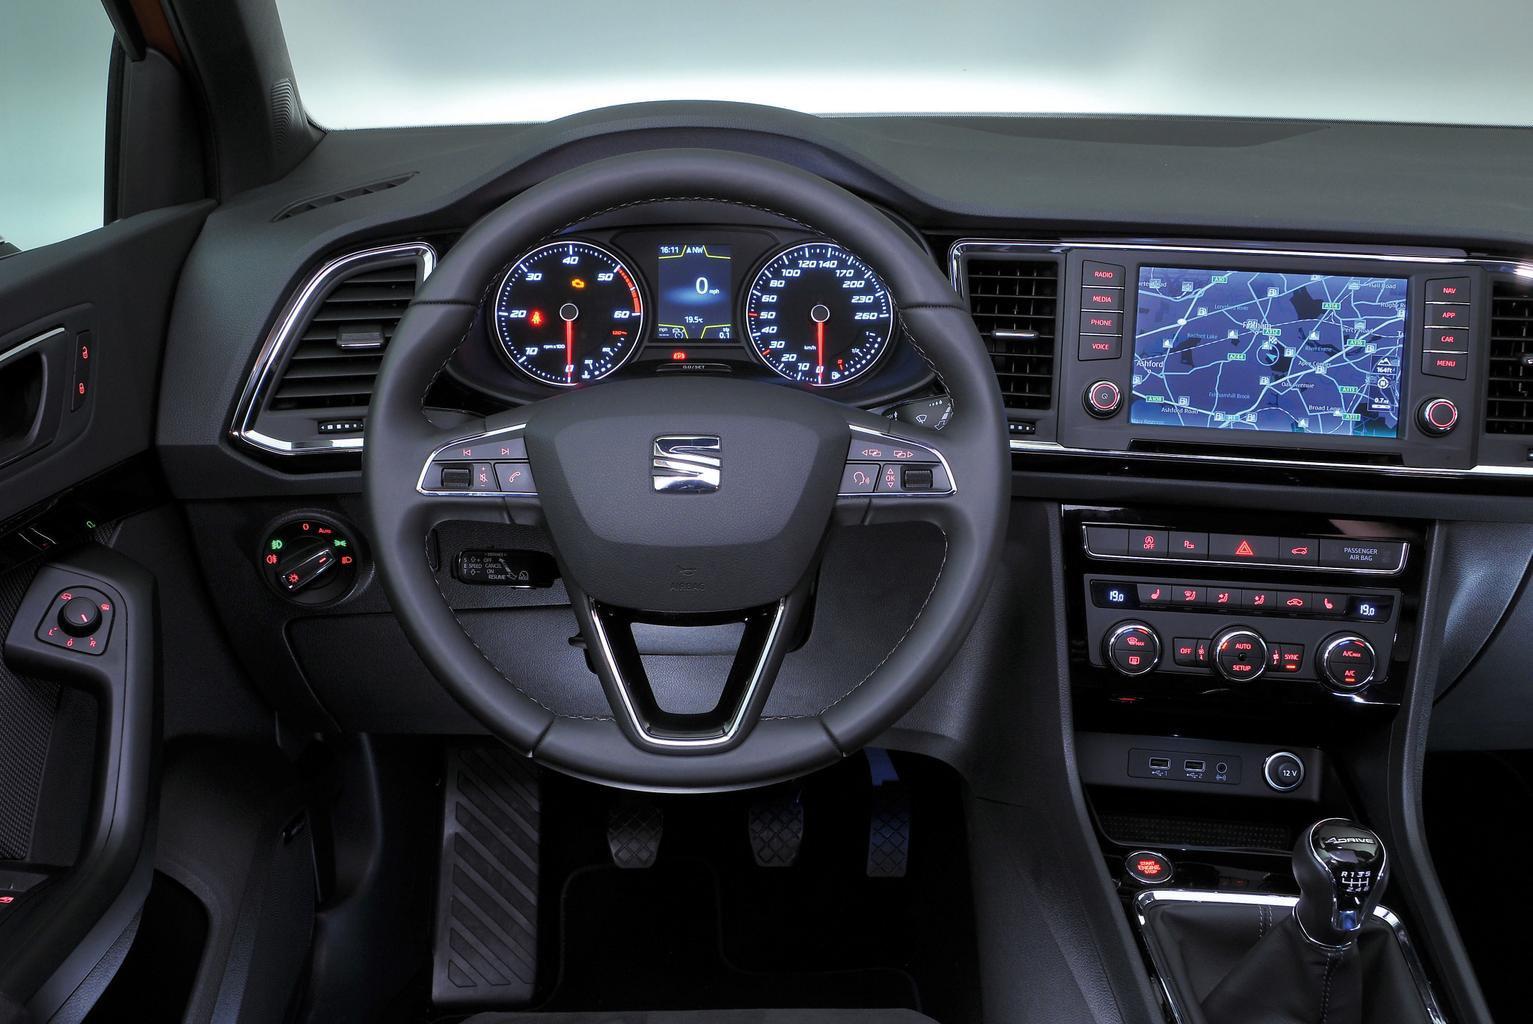 Seat Ateca vs Nissan Qashqai and Kia Sportage